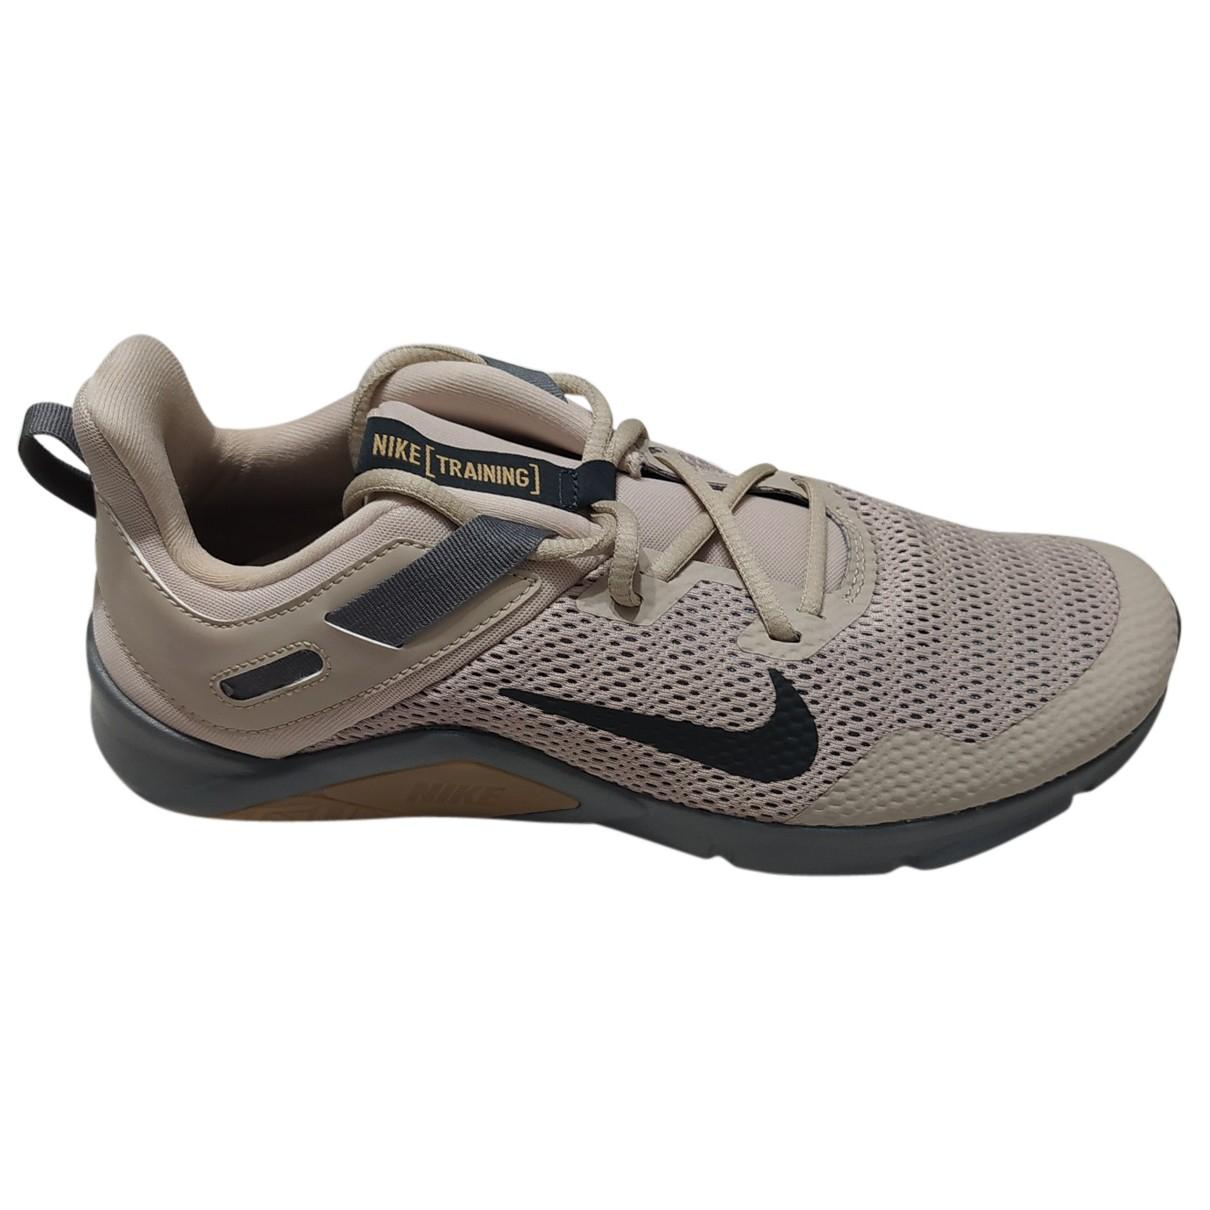 Nike \N Sneakers in  Beige Leinen